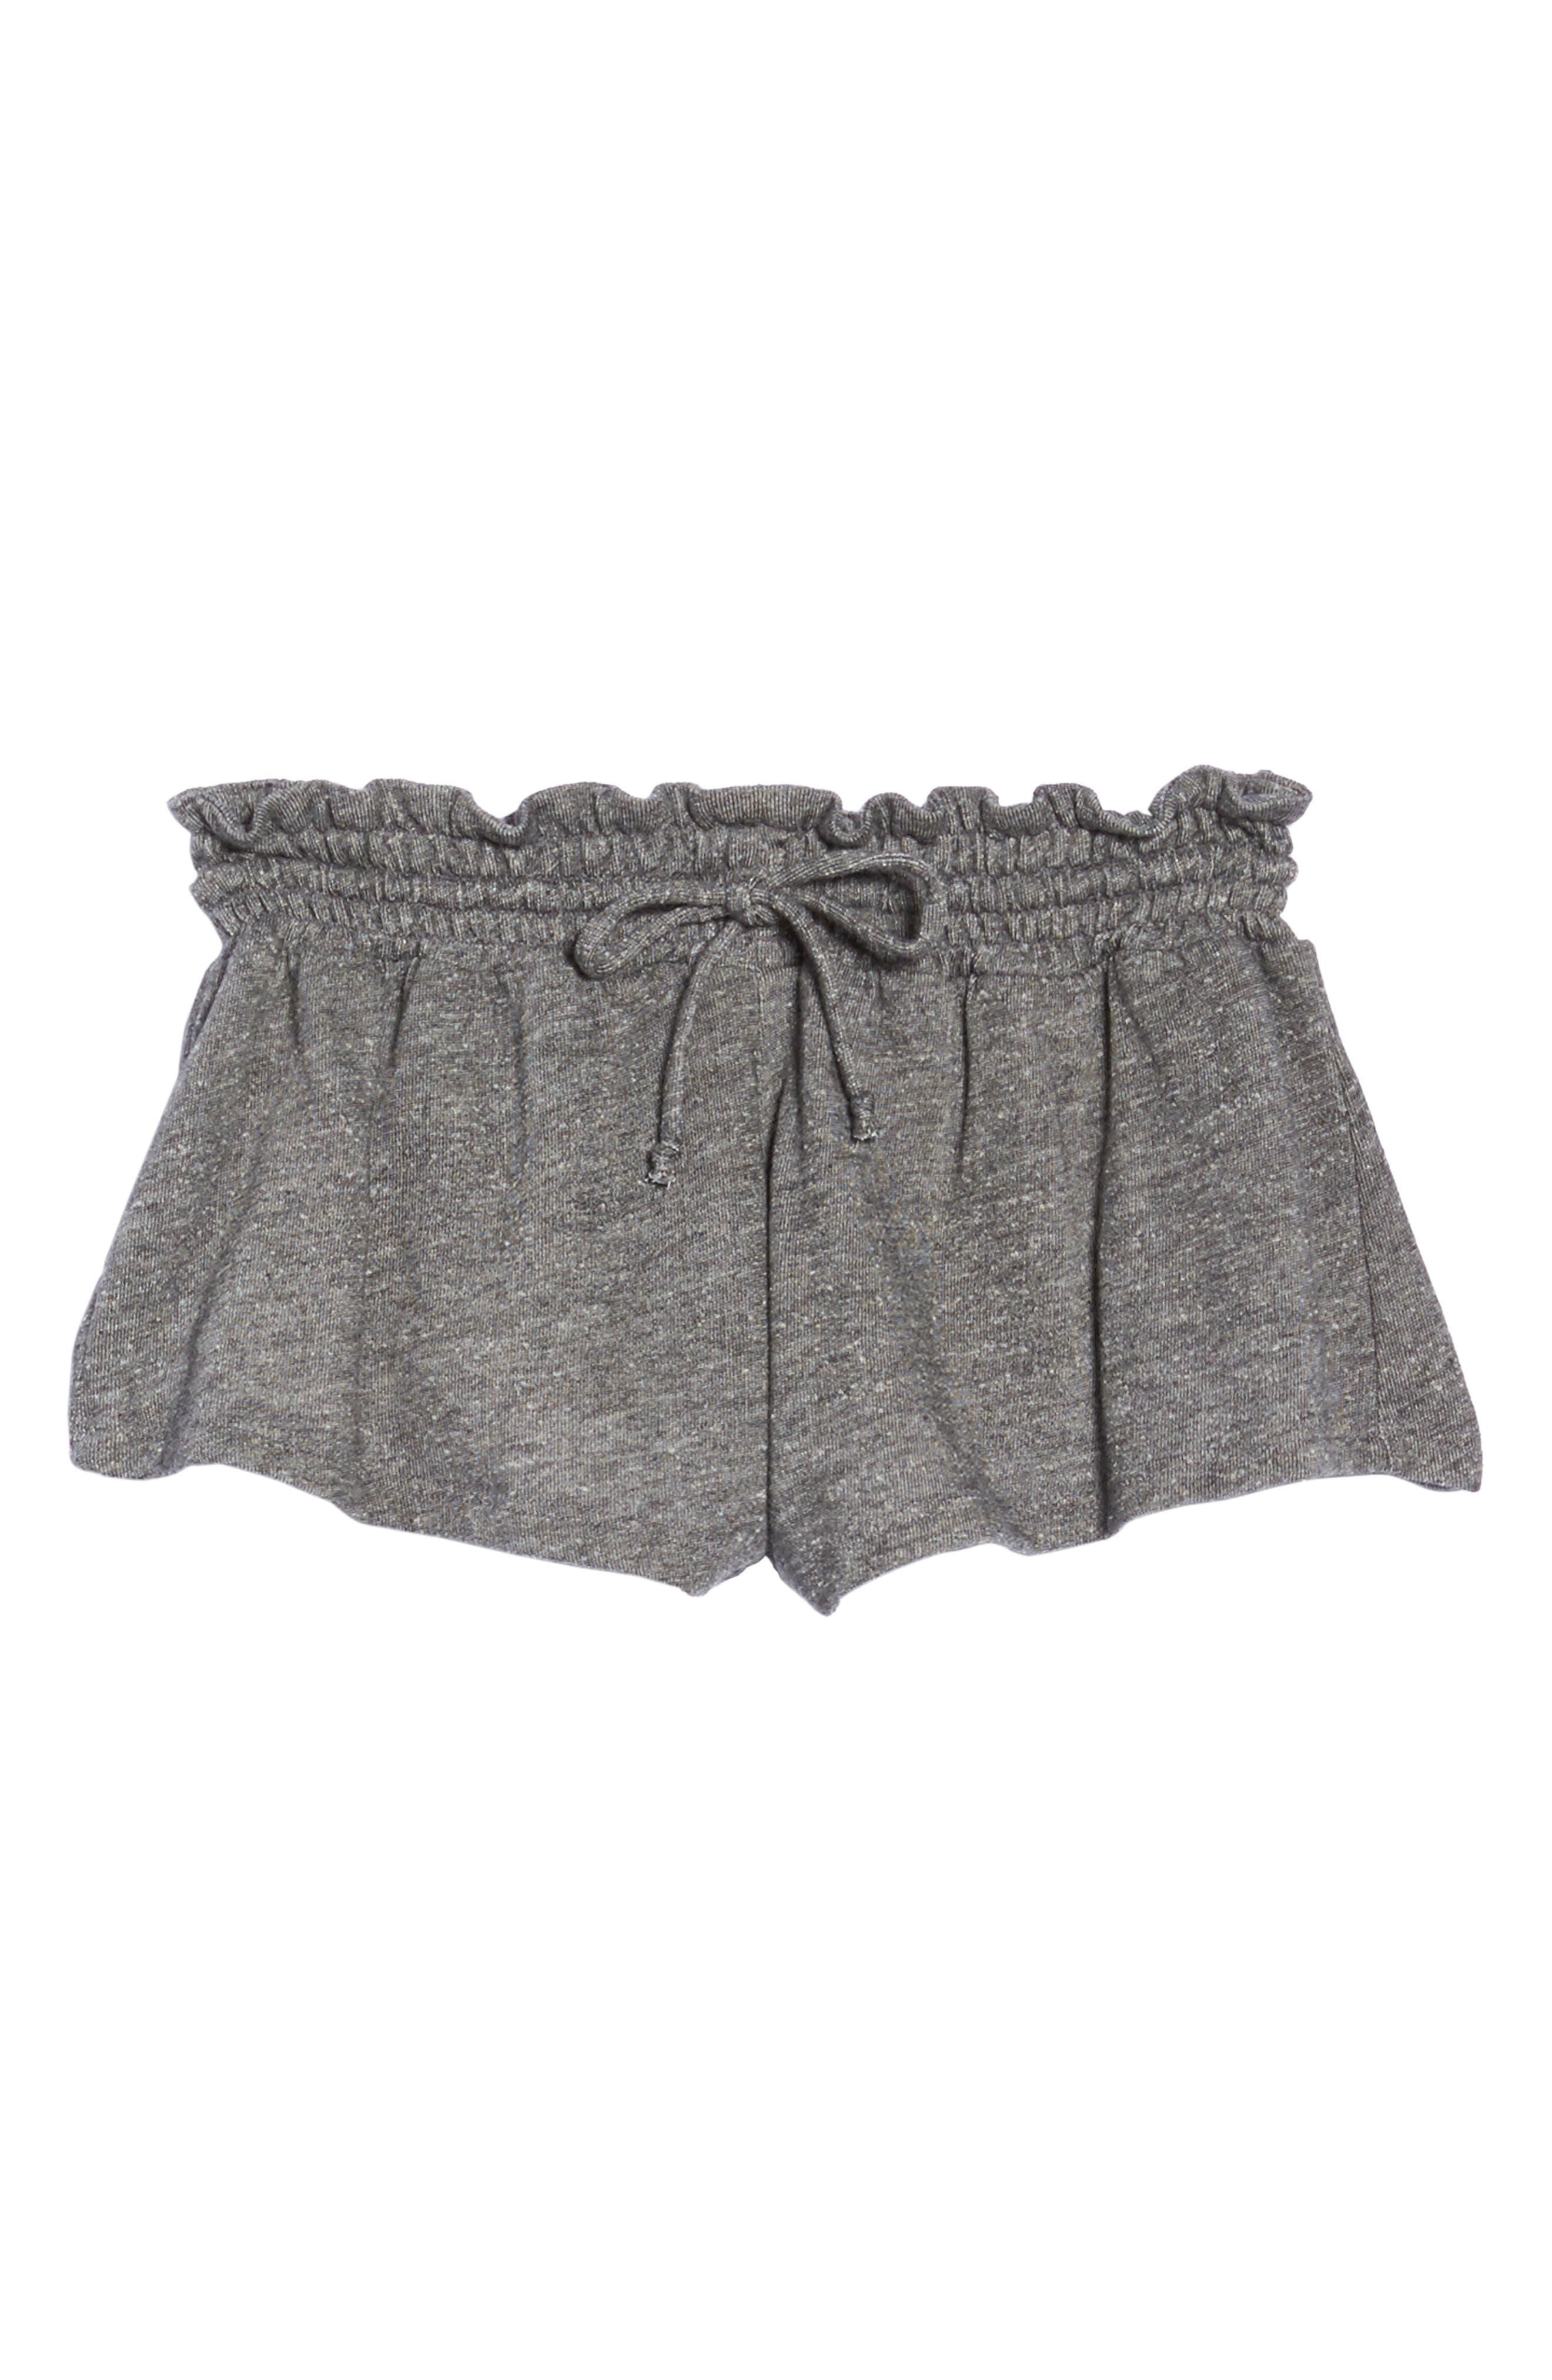 Dallas Shorts,                             Alternate thumbnail 4, color,                             Charcoal